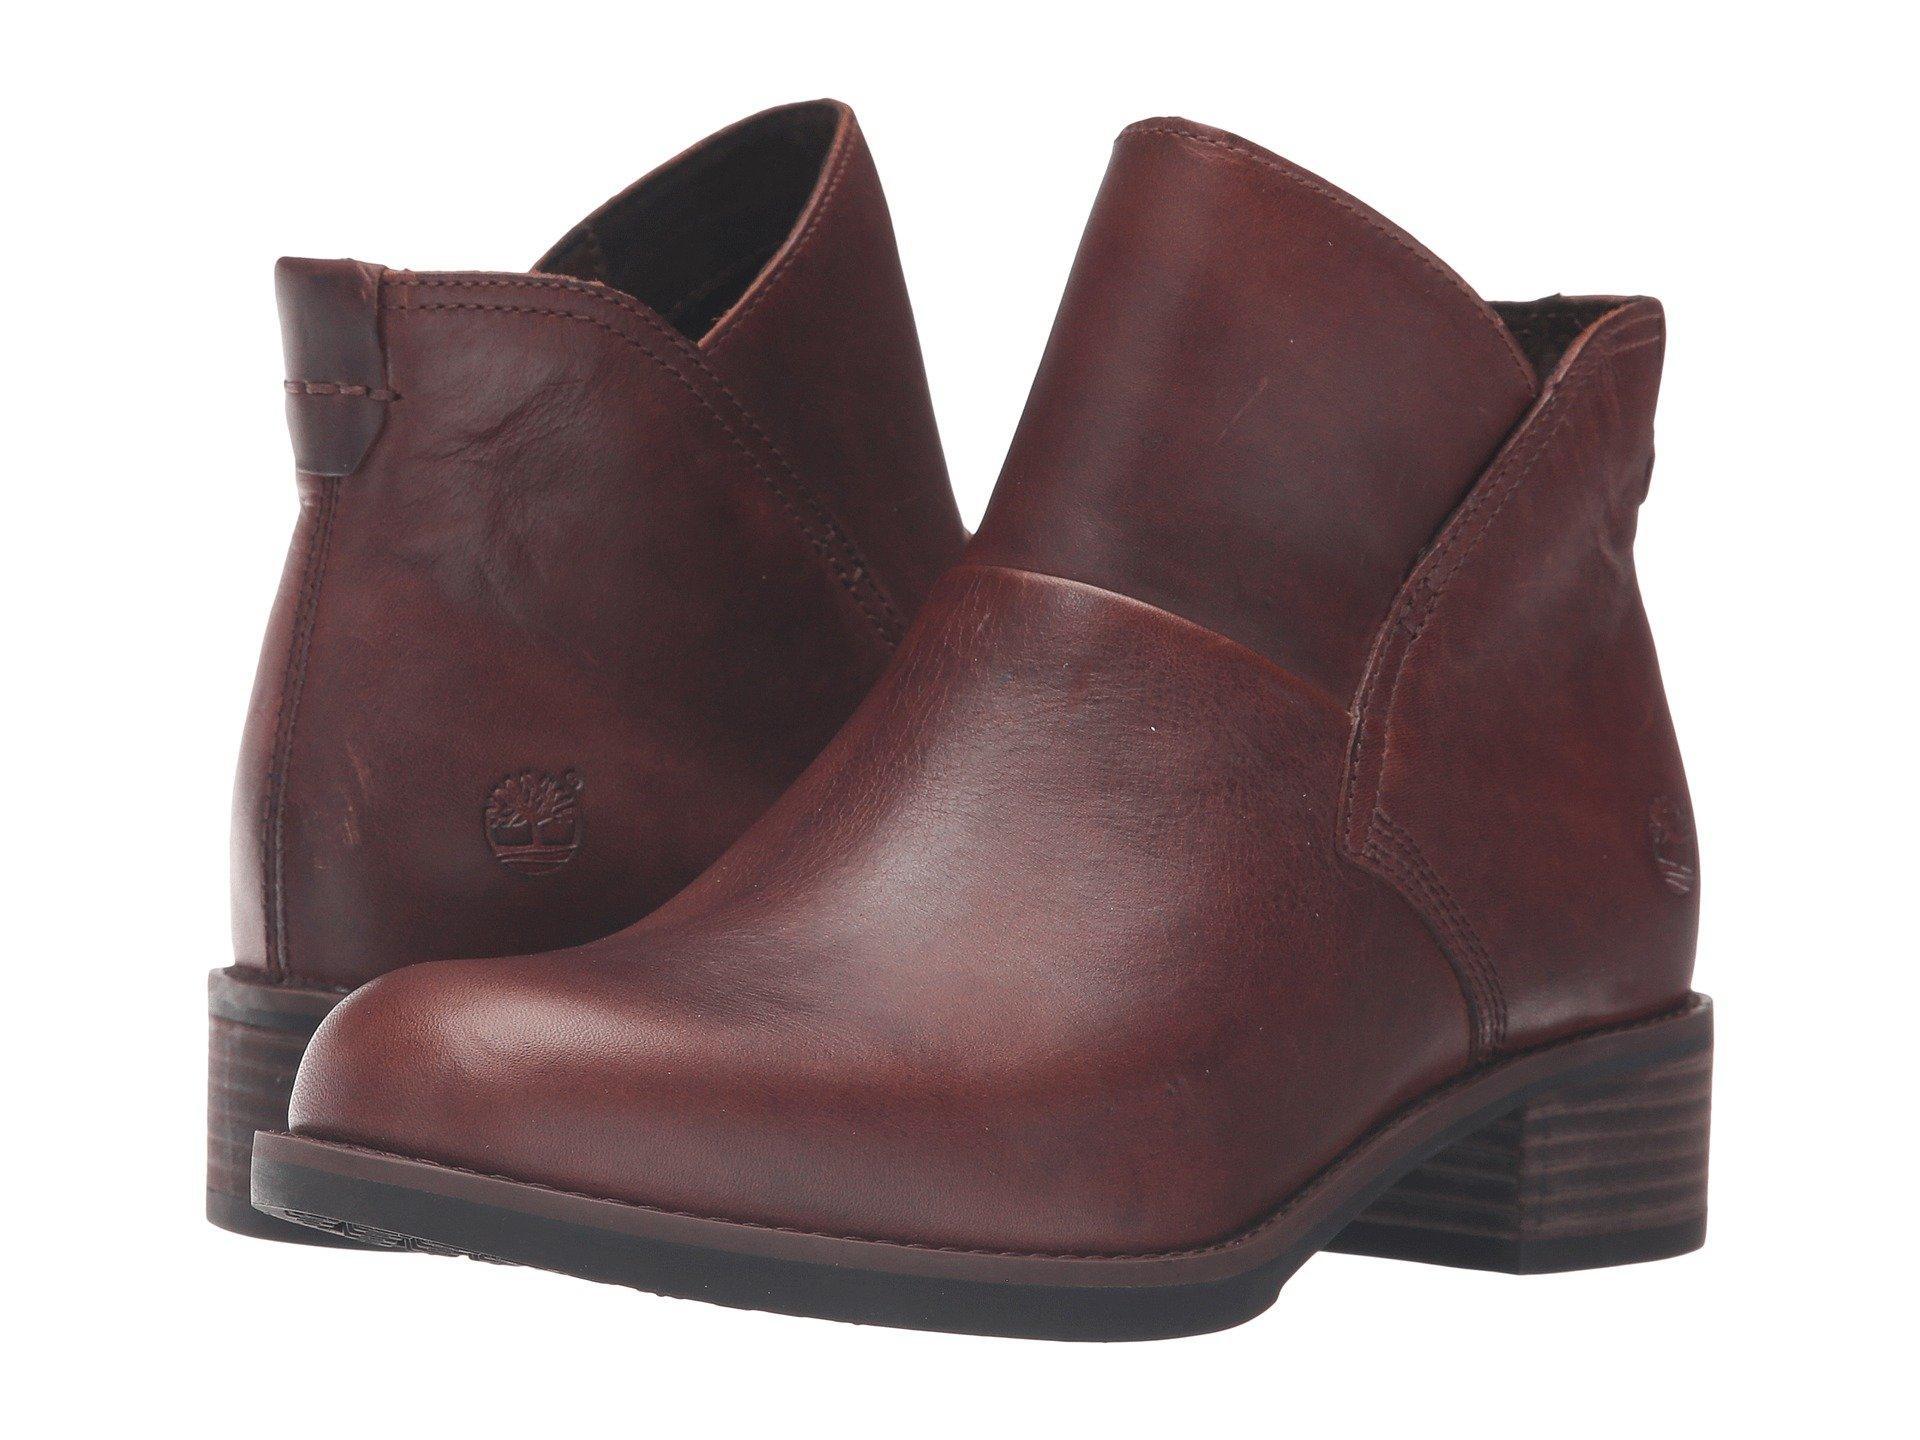 Beckwith Side Zip Chelsea Boot, Medium Brown Full Grain